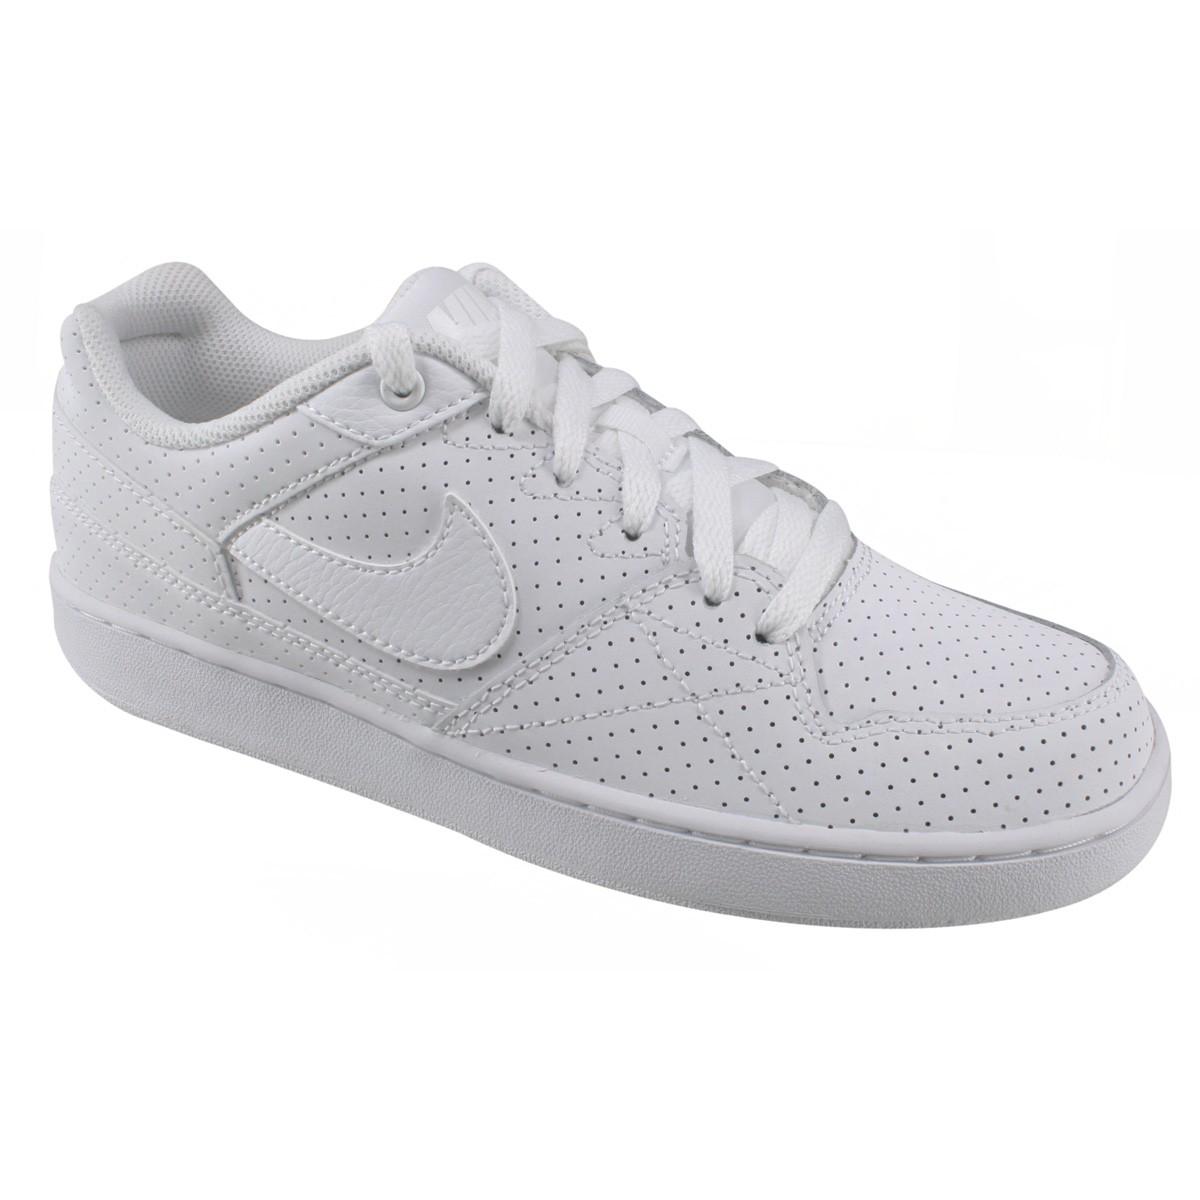 338b1f34a50 Tenis Nike Priority Low Masculino 641894-110 - Branco - Botas Online ...